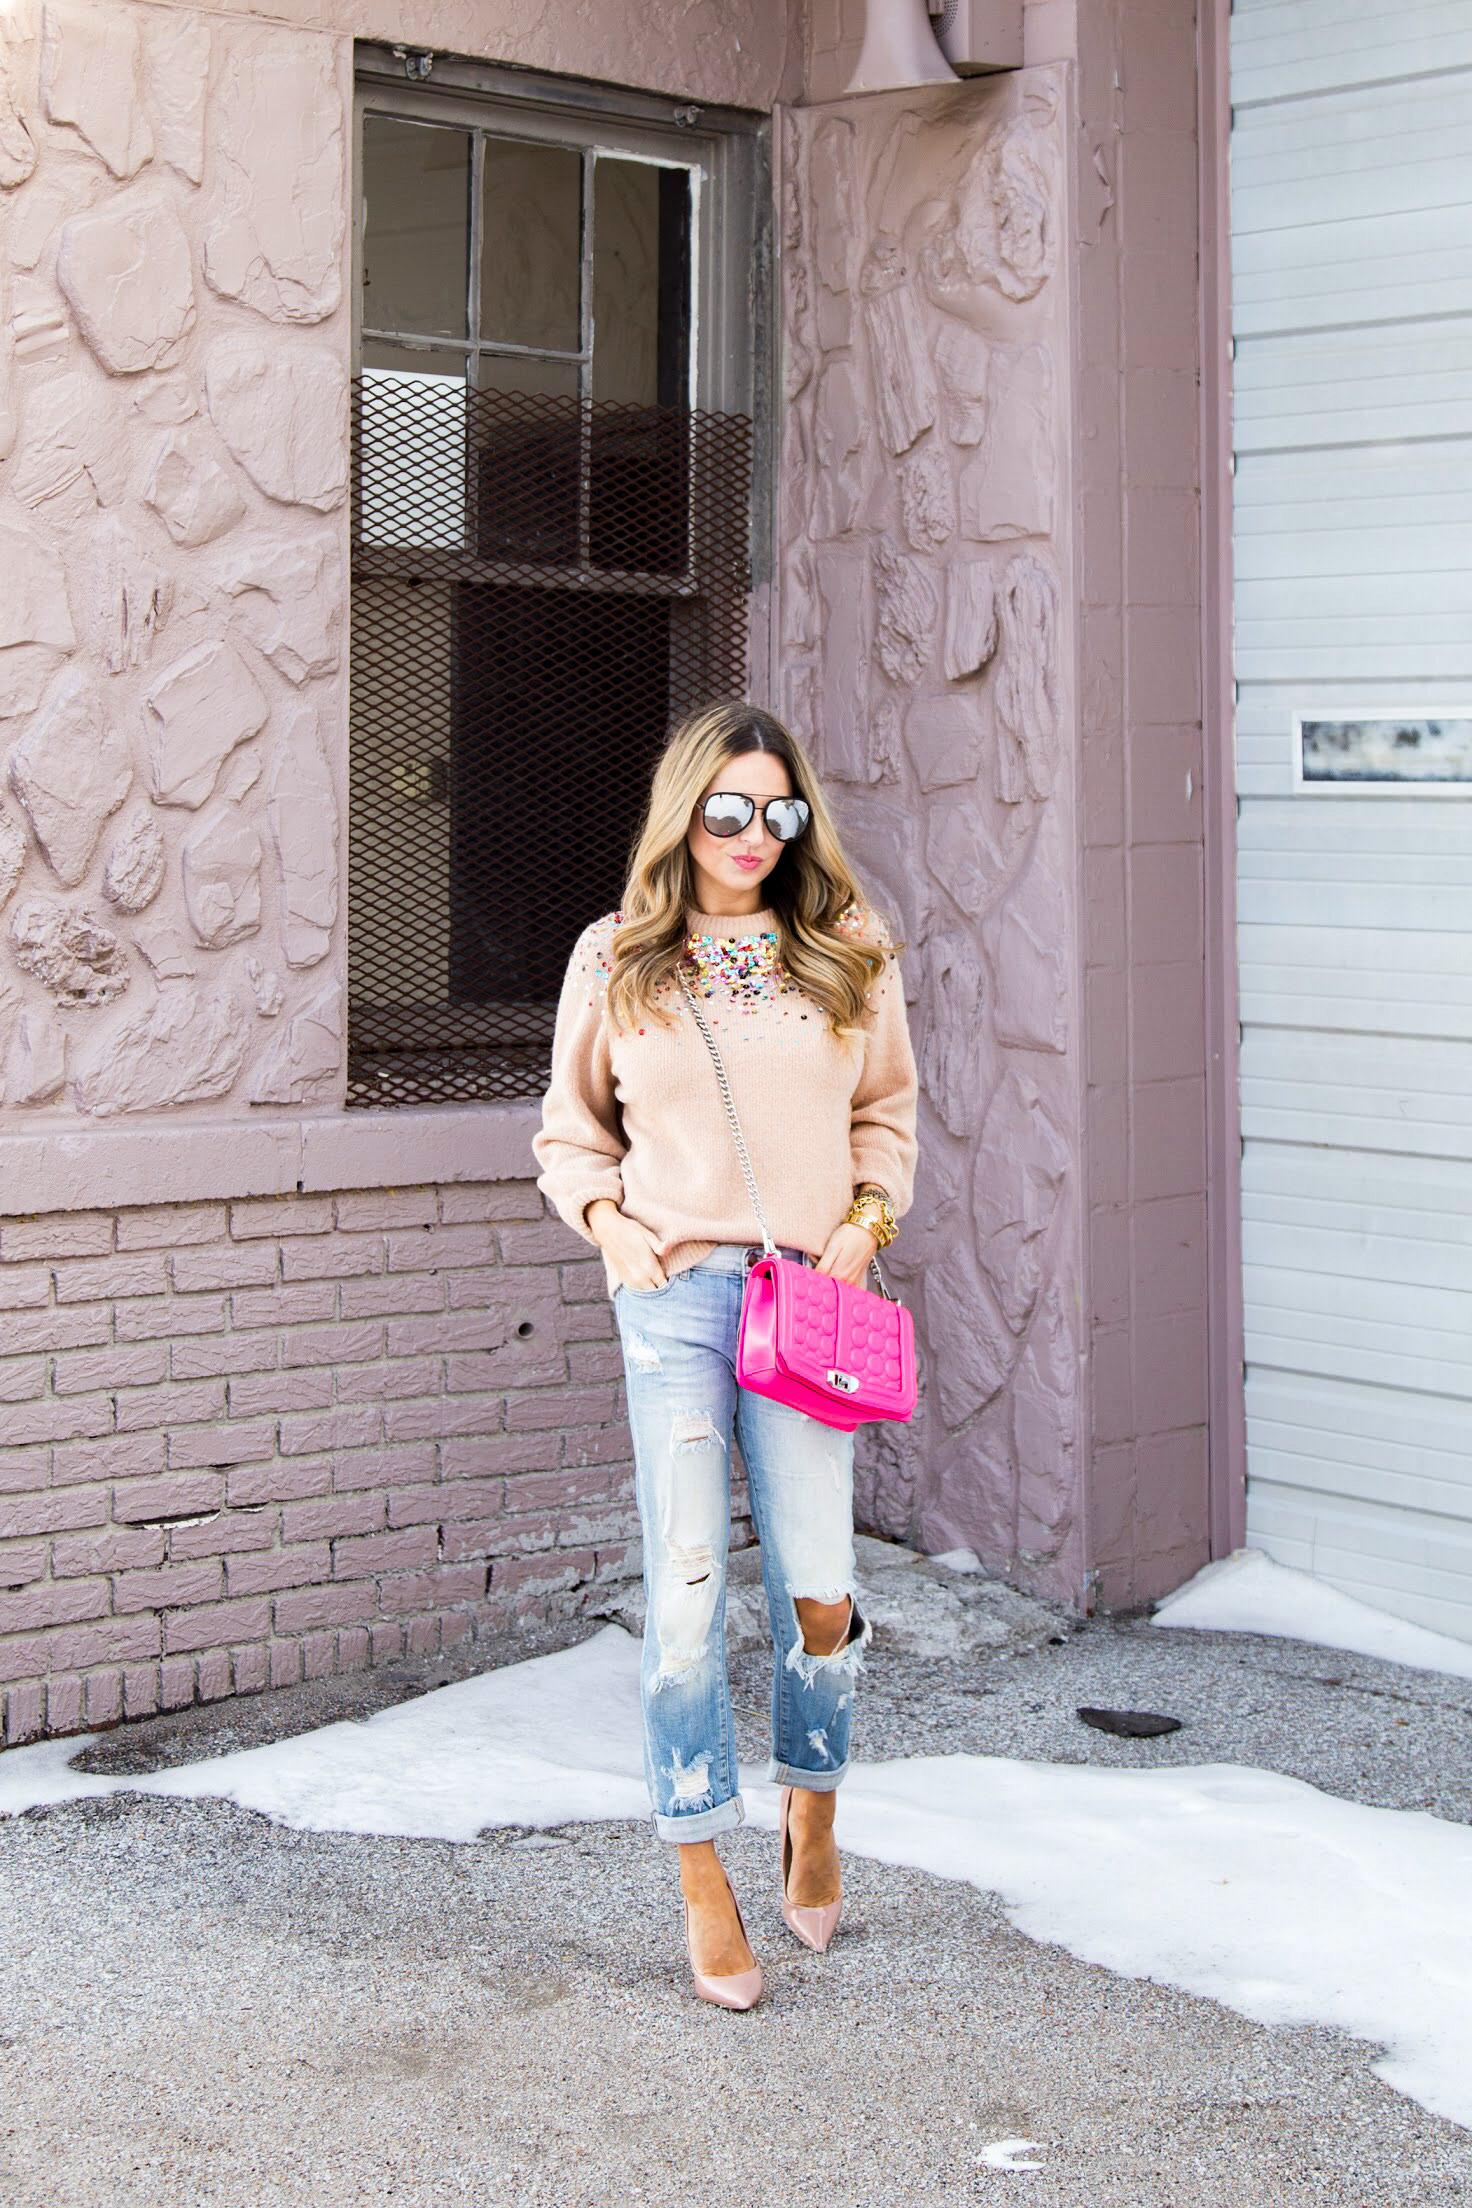 SheIn sequin sweater, pink Jumbo Rebecca Minkoff, SheIn sweater